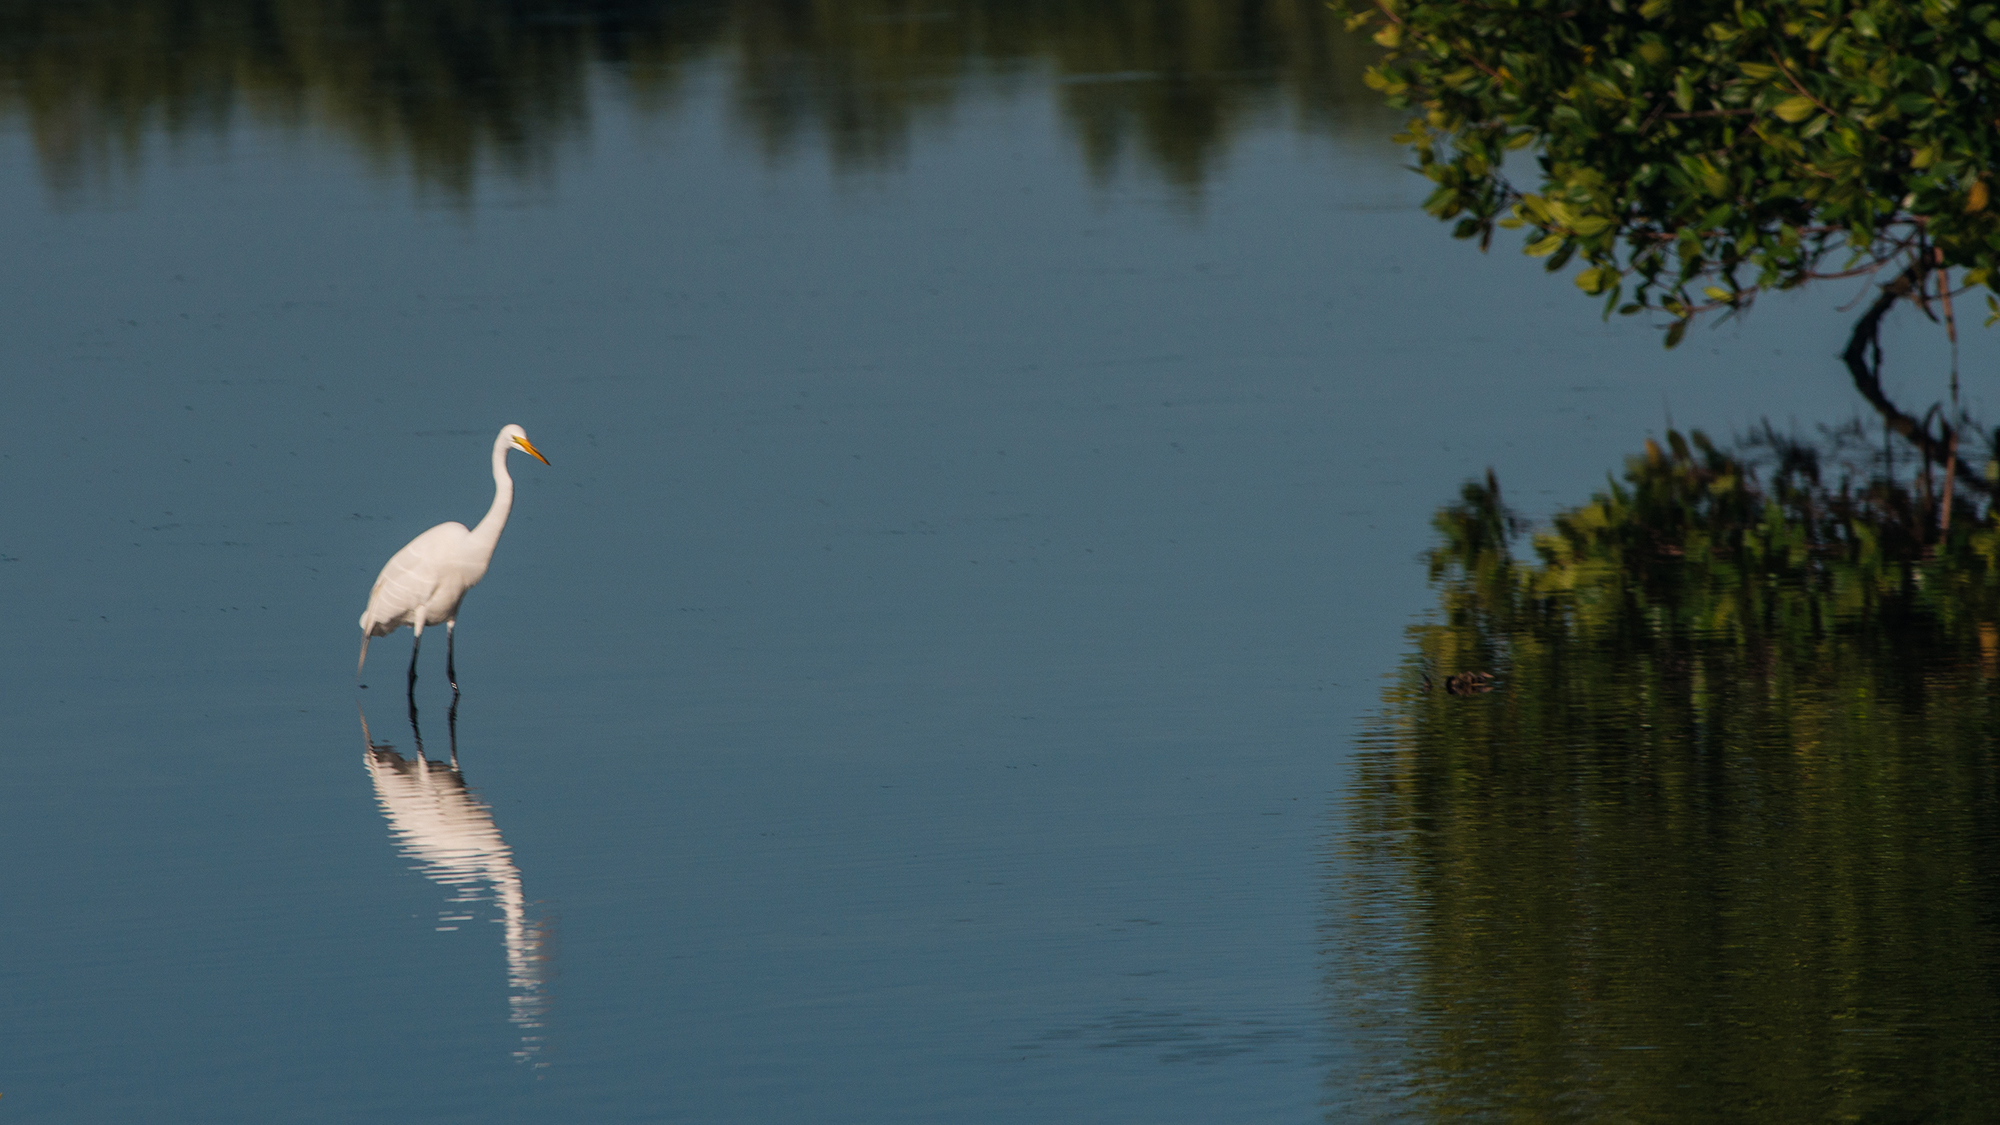 #greategret, #egret, #sanibel, #dingdarling, #florida, #wildlife, #nature, #bird, #reflection, #blueandgreen